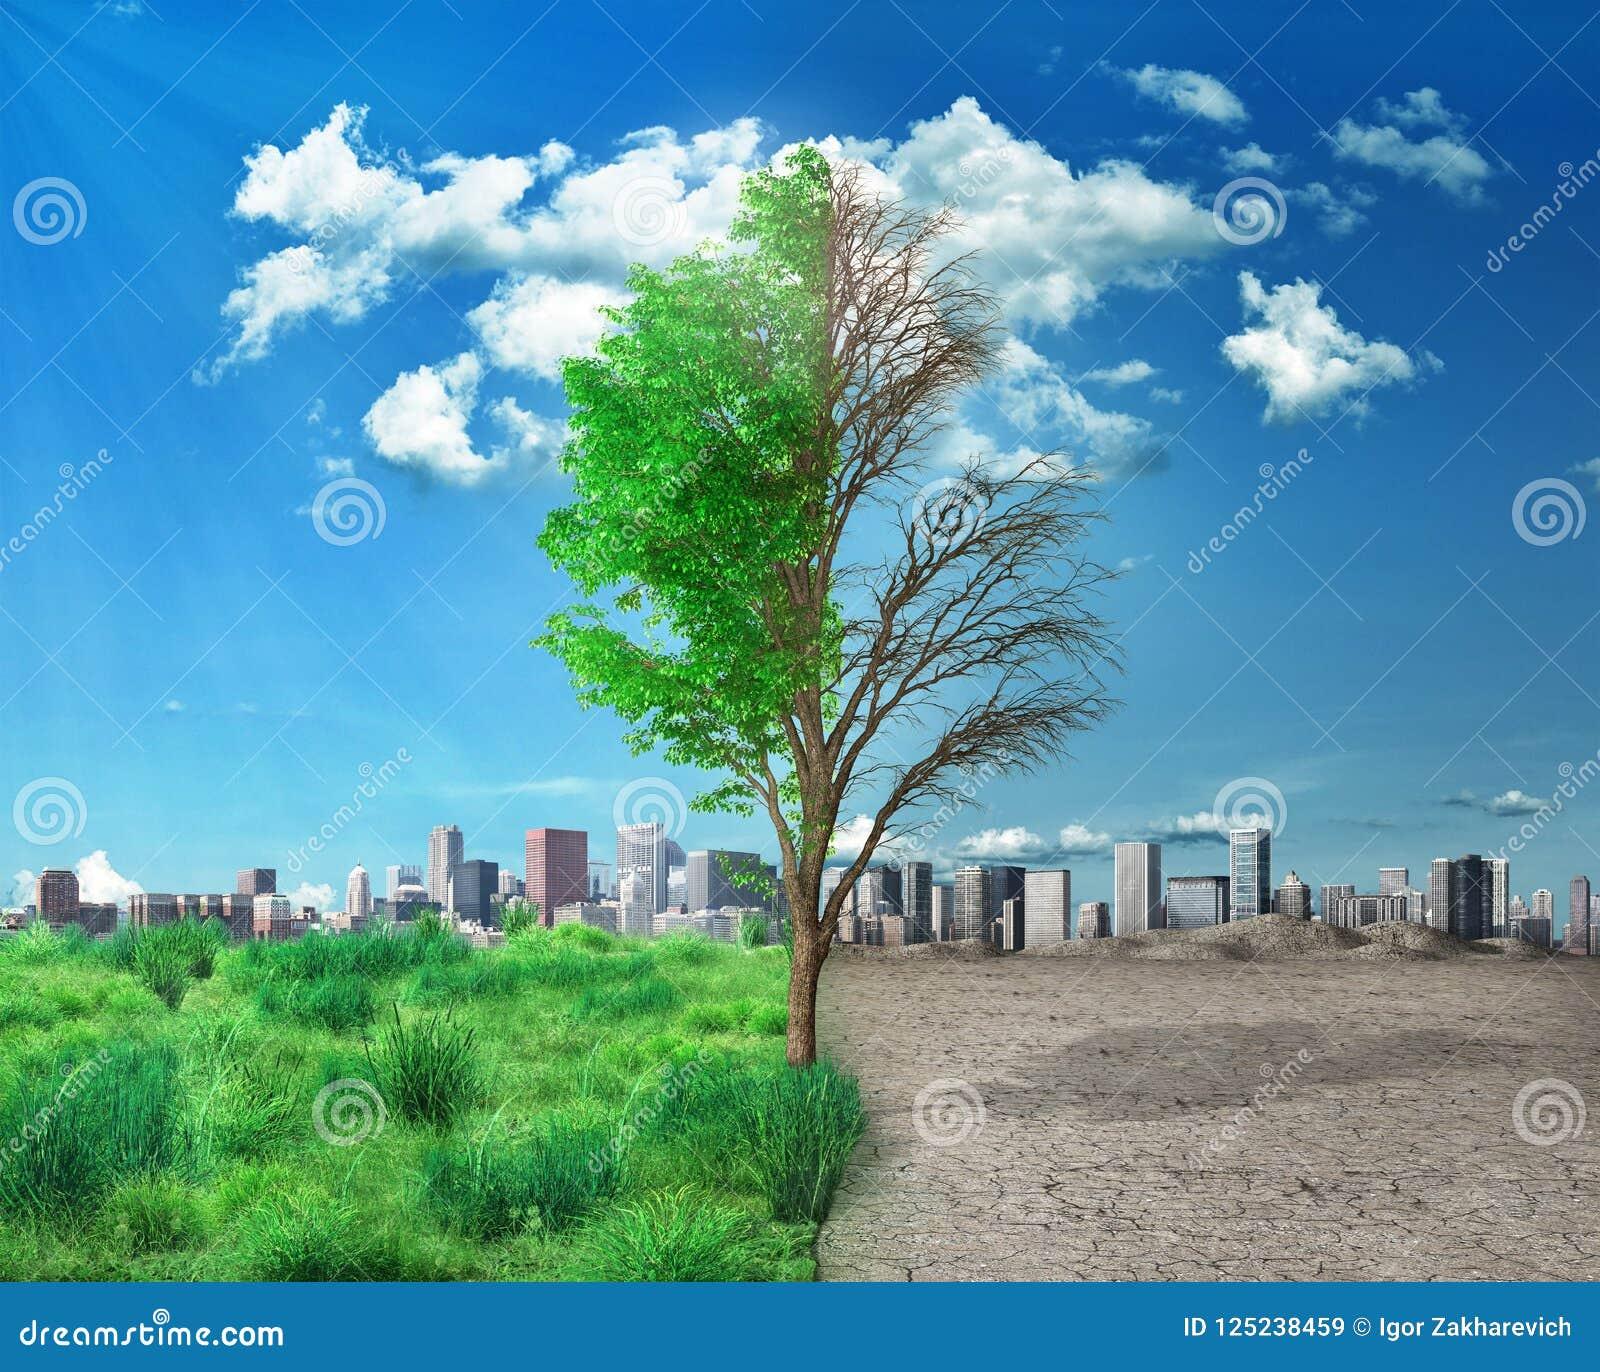 Half Alive And Half Dead Tree Sta Stock Illustration Illustration